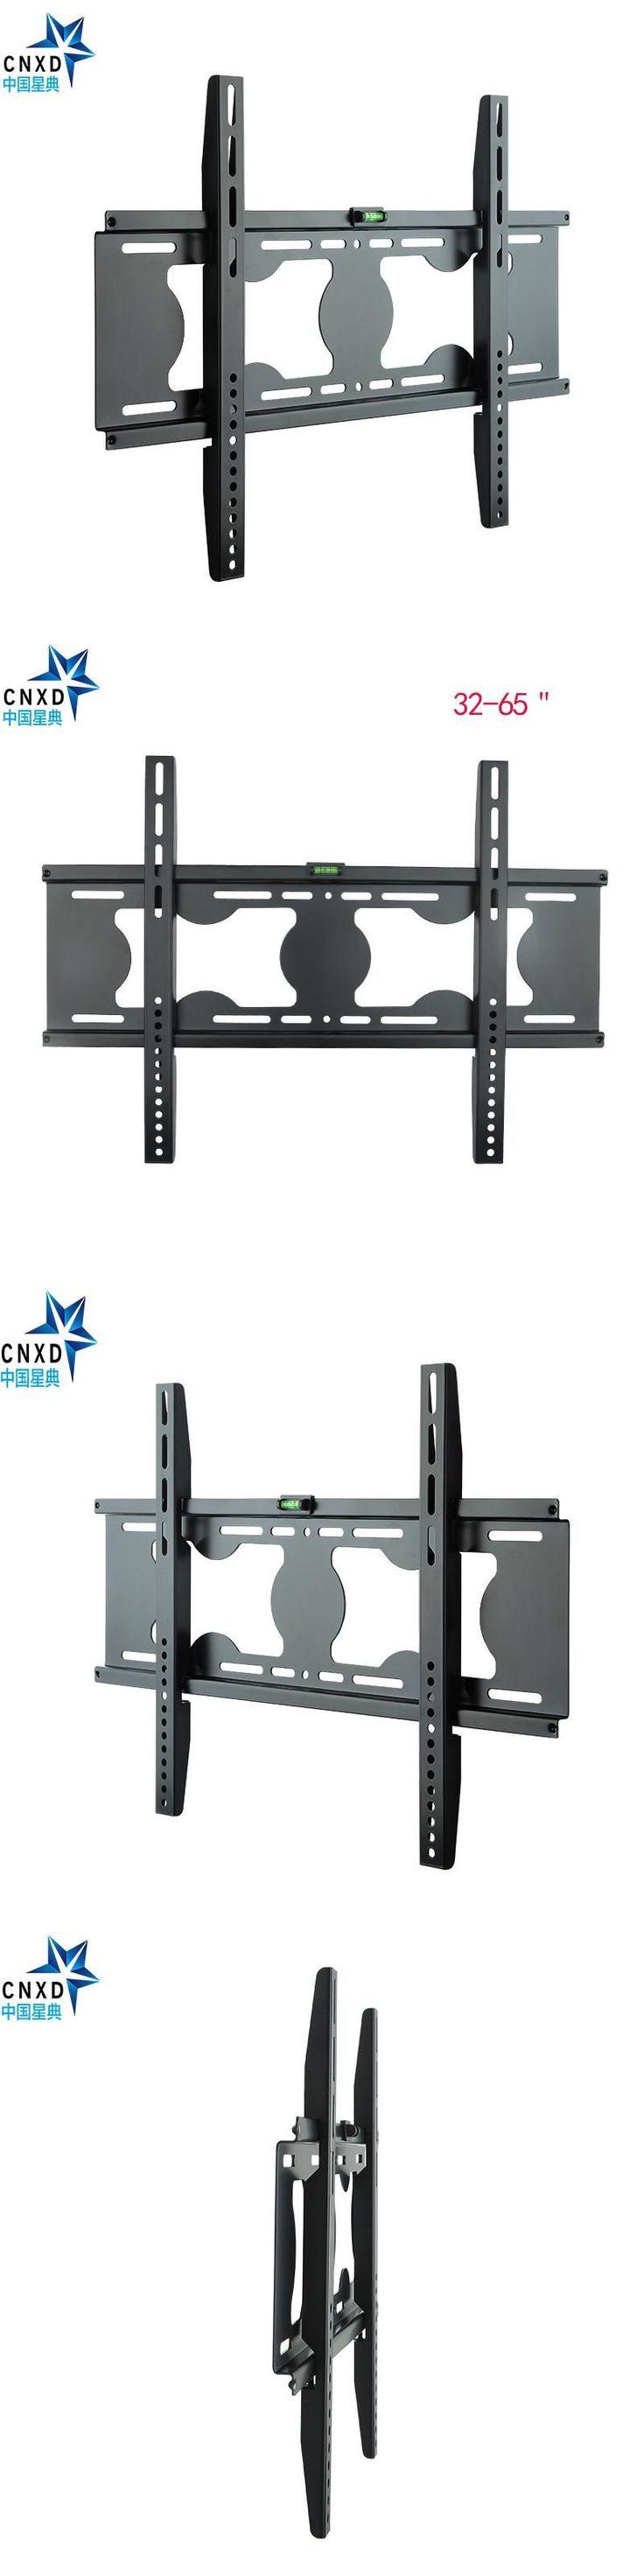 Sliding TV Wall Mount Universal TV Wall Stand Bracket  TV Holder for Most 32 ~ 65 Inch HDTV Flat Panel TV